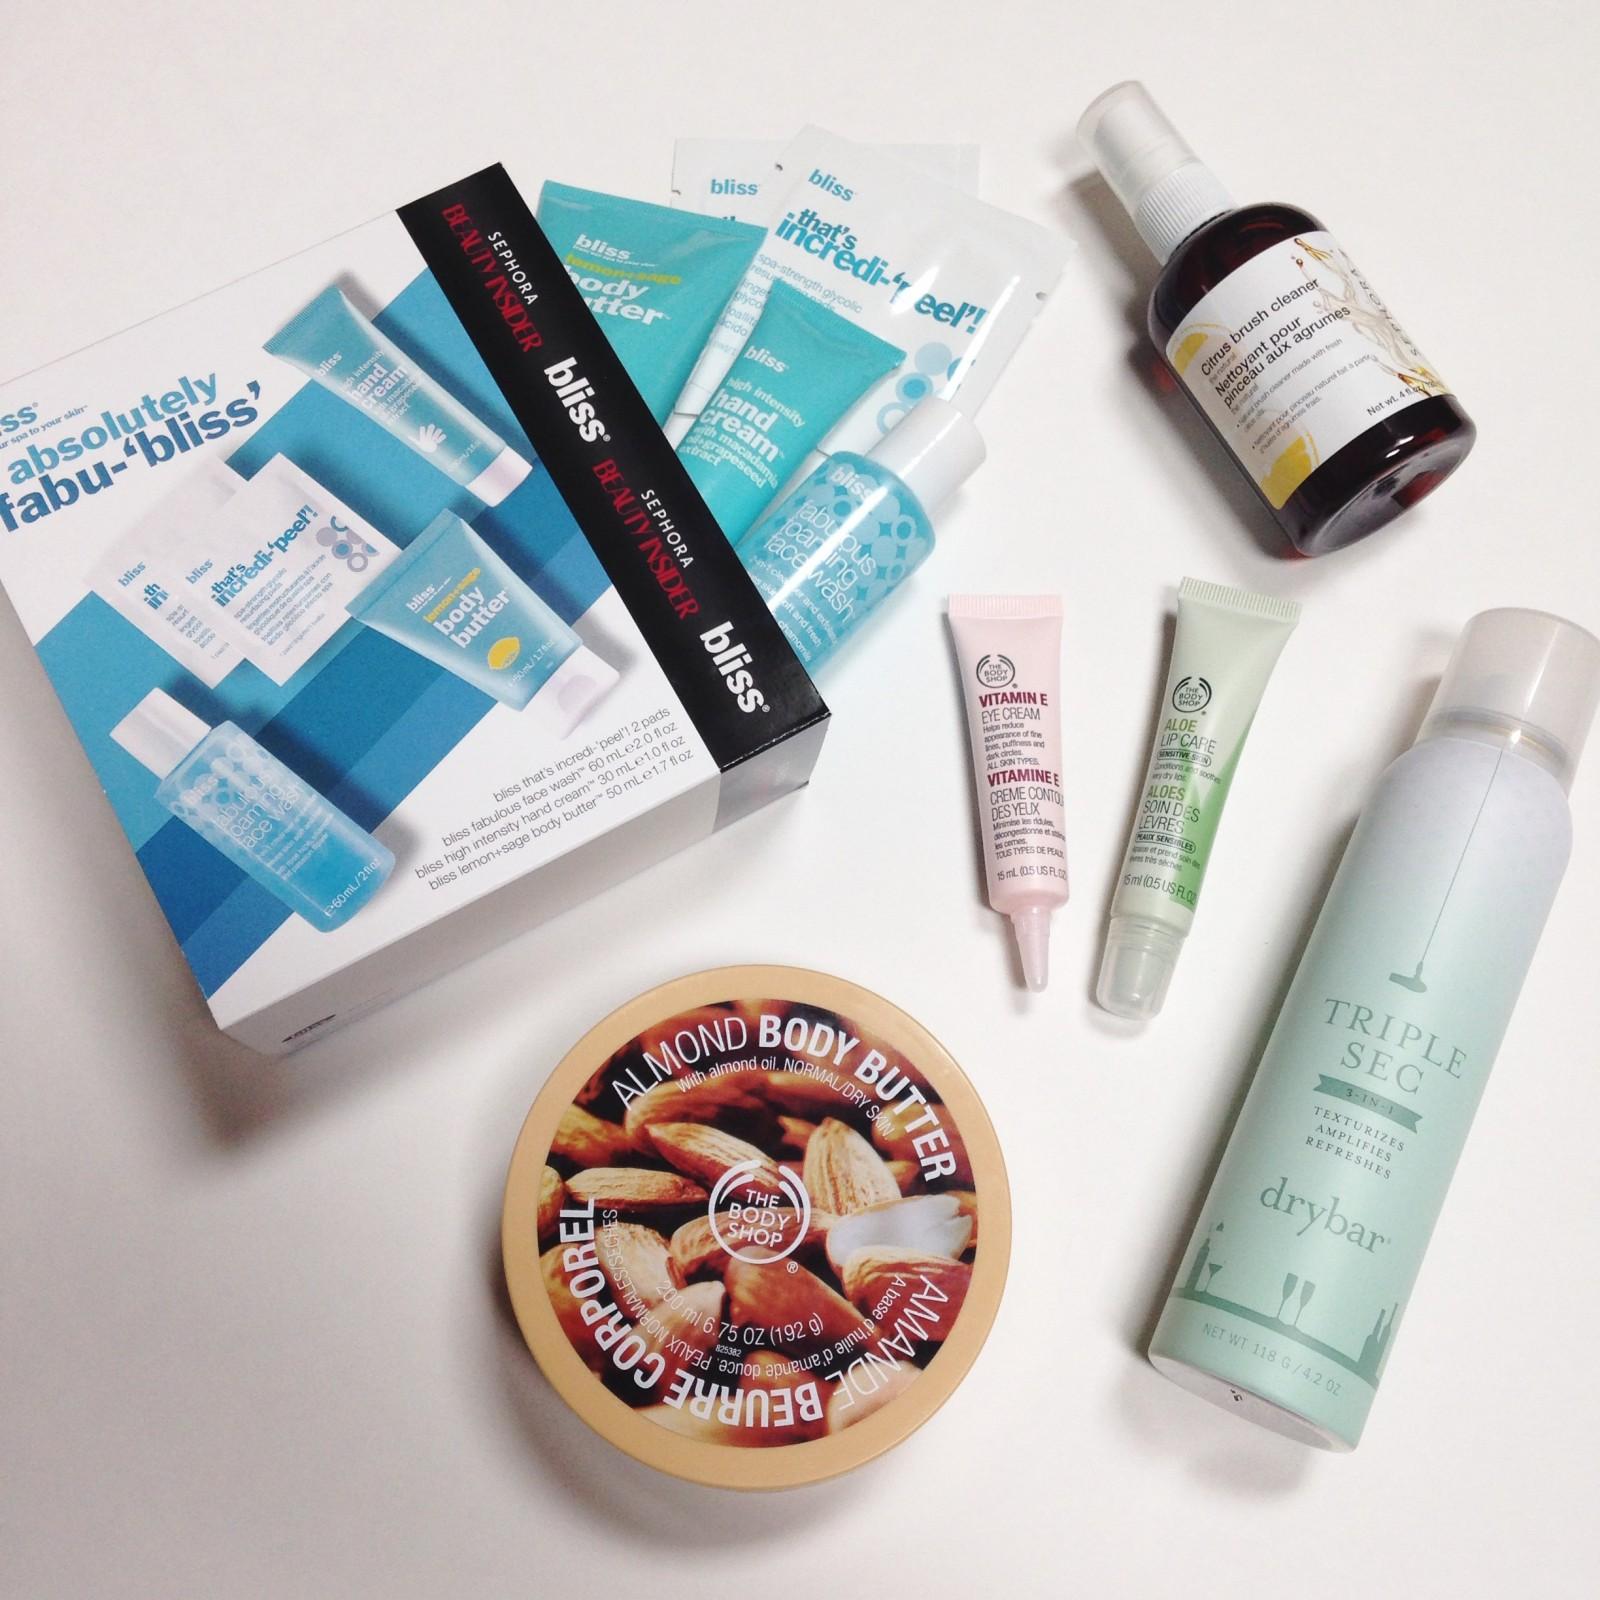 Haul: Sephora & The Body Shop